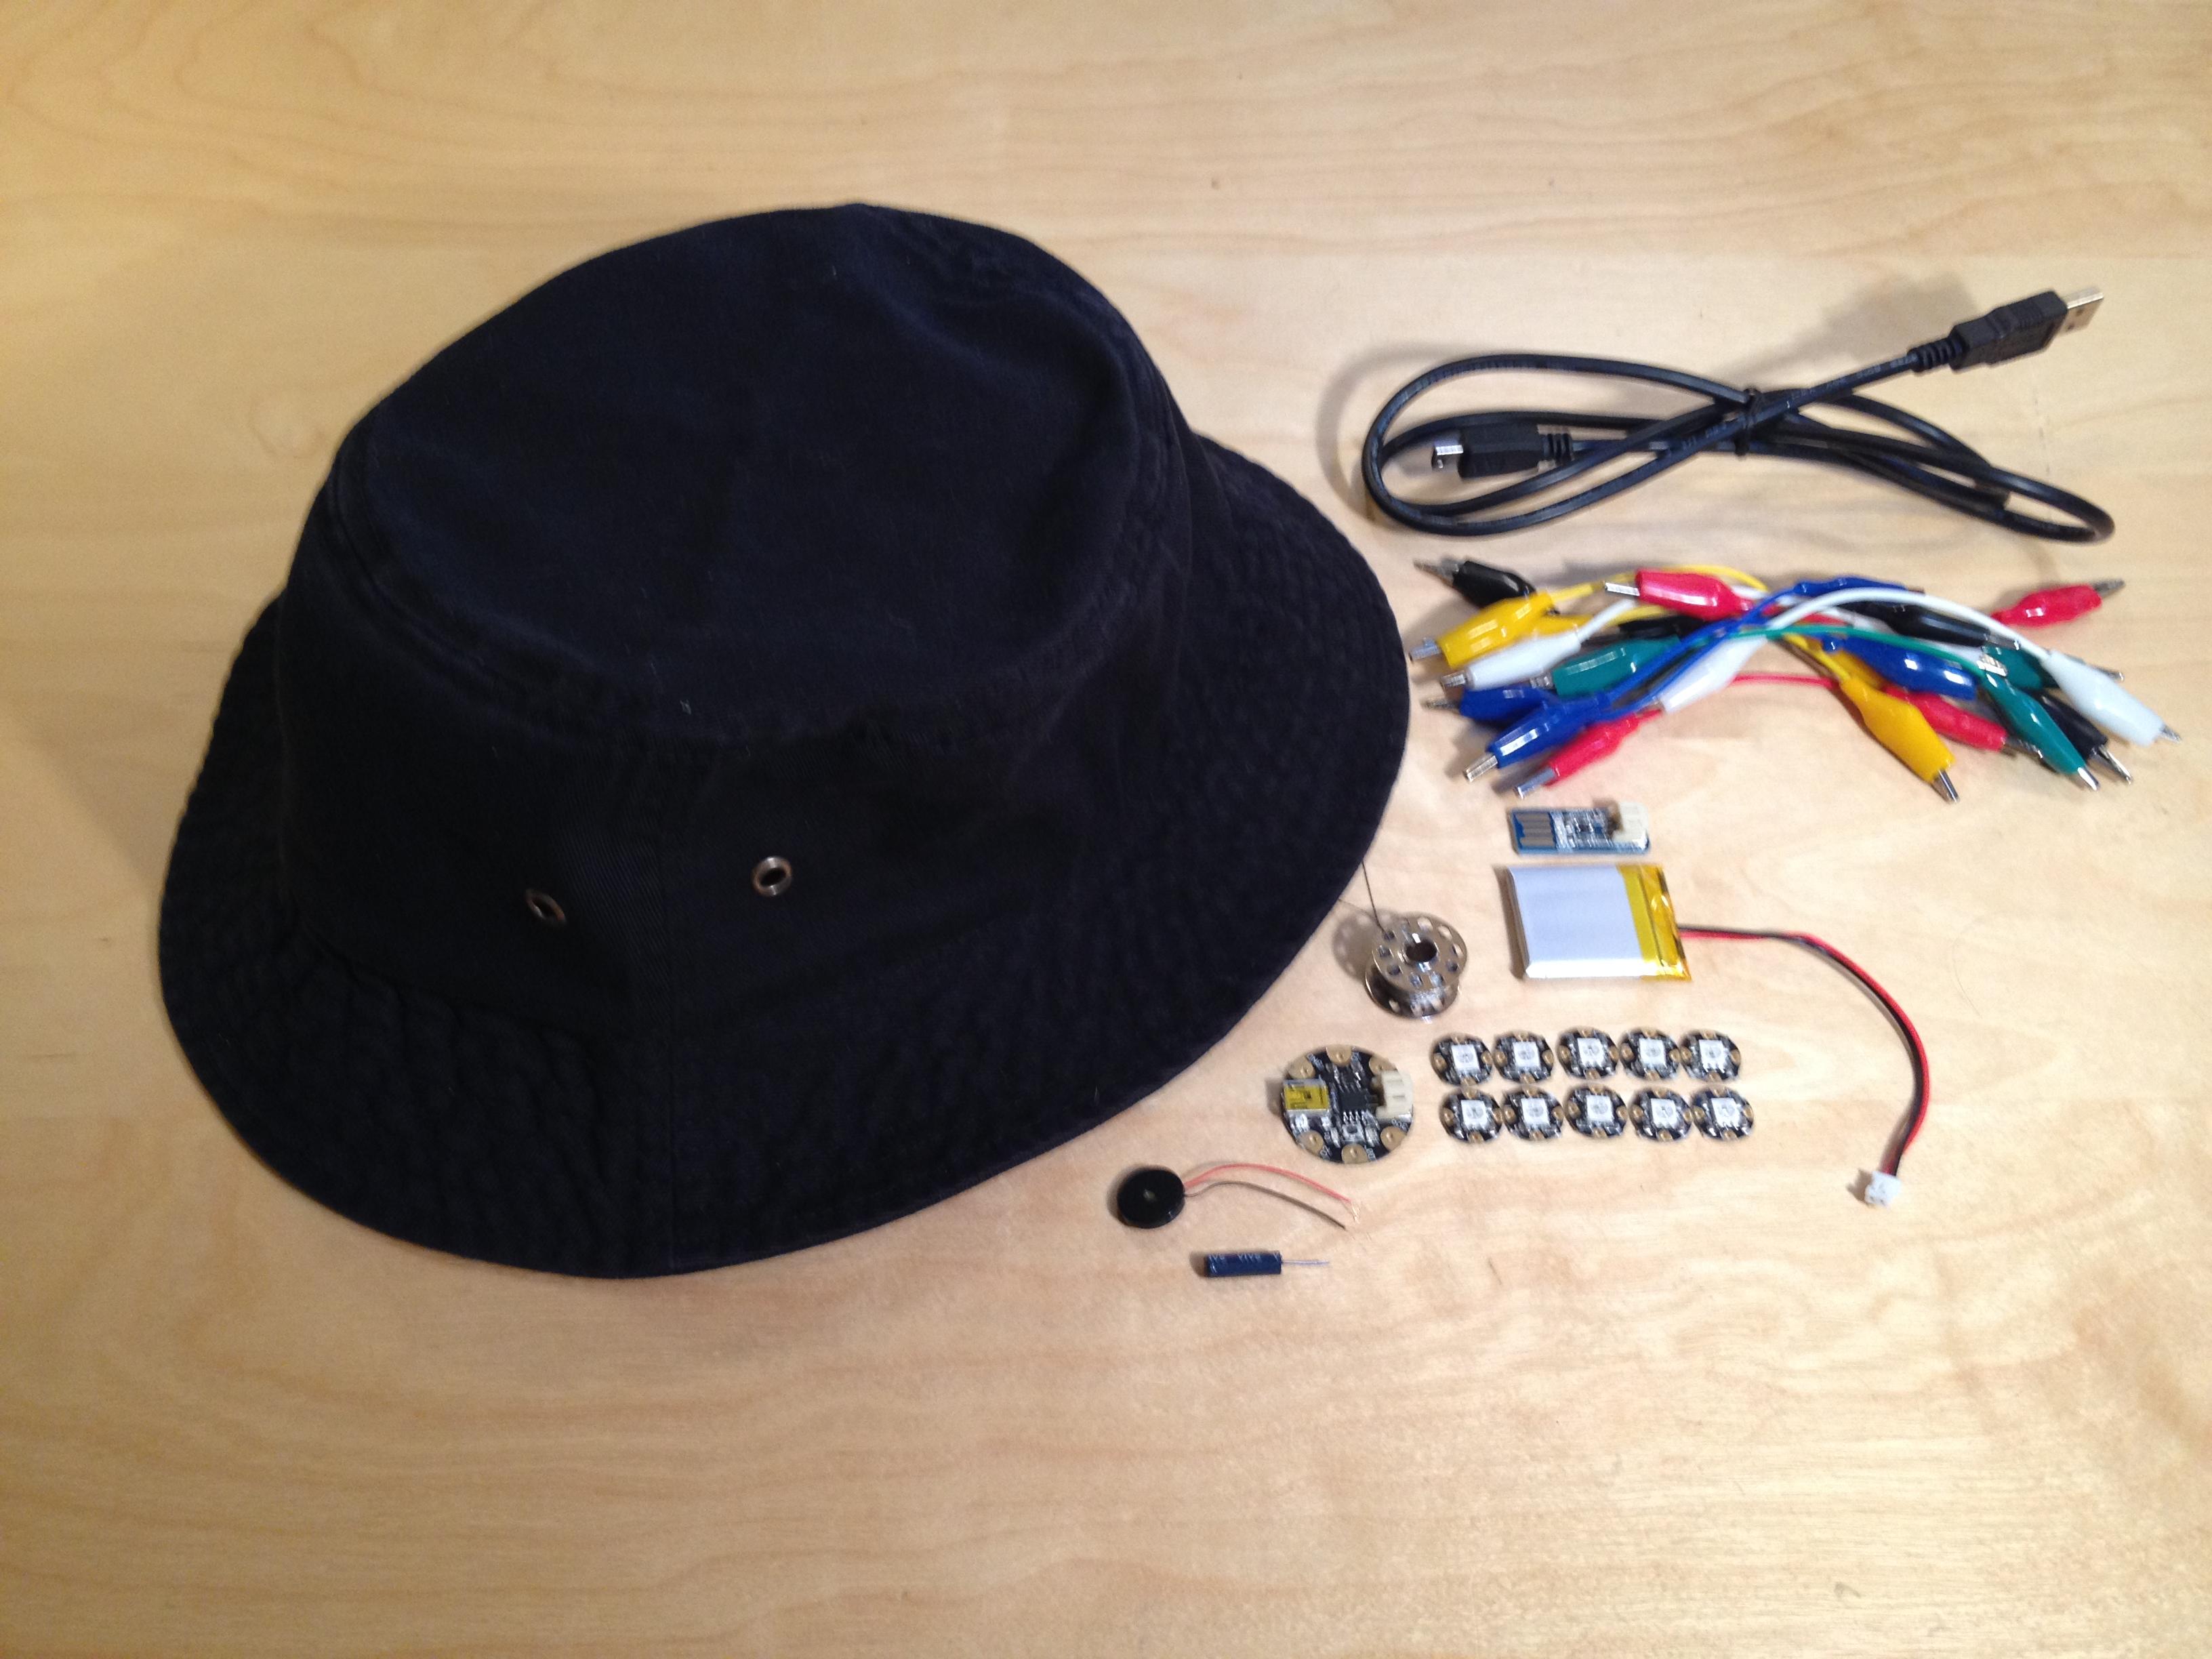 sensors_Hat_Supplies.jpg